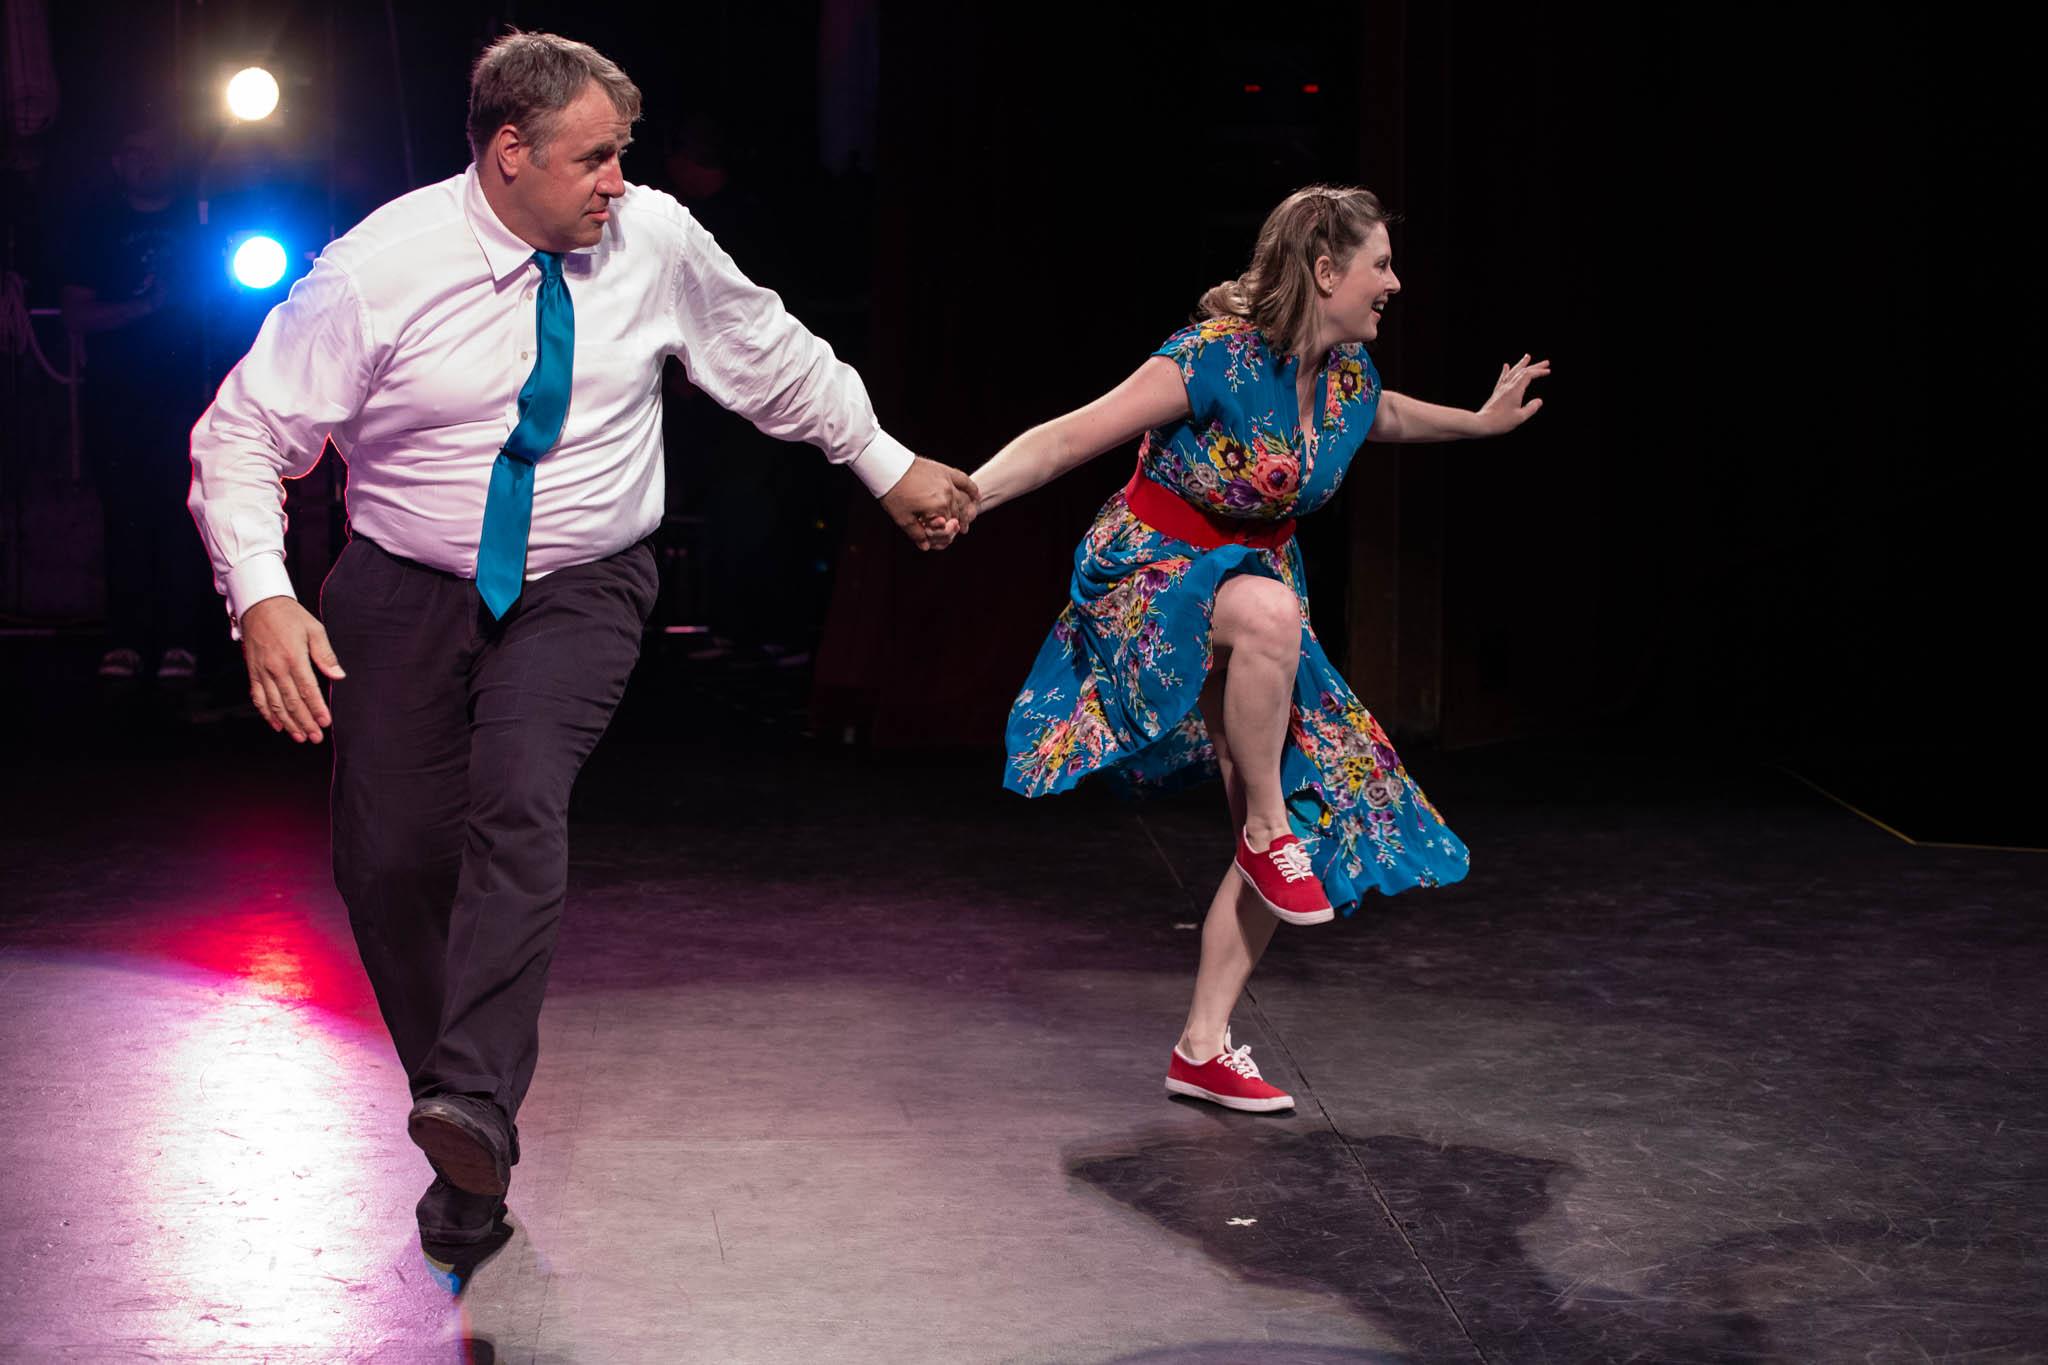 Tom Cross and Amber Kaufman Lindy Hop